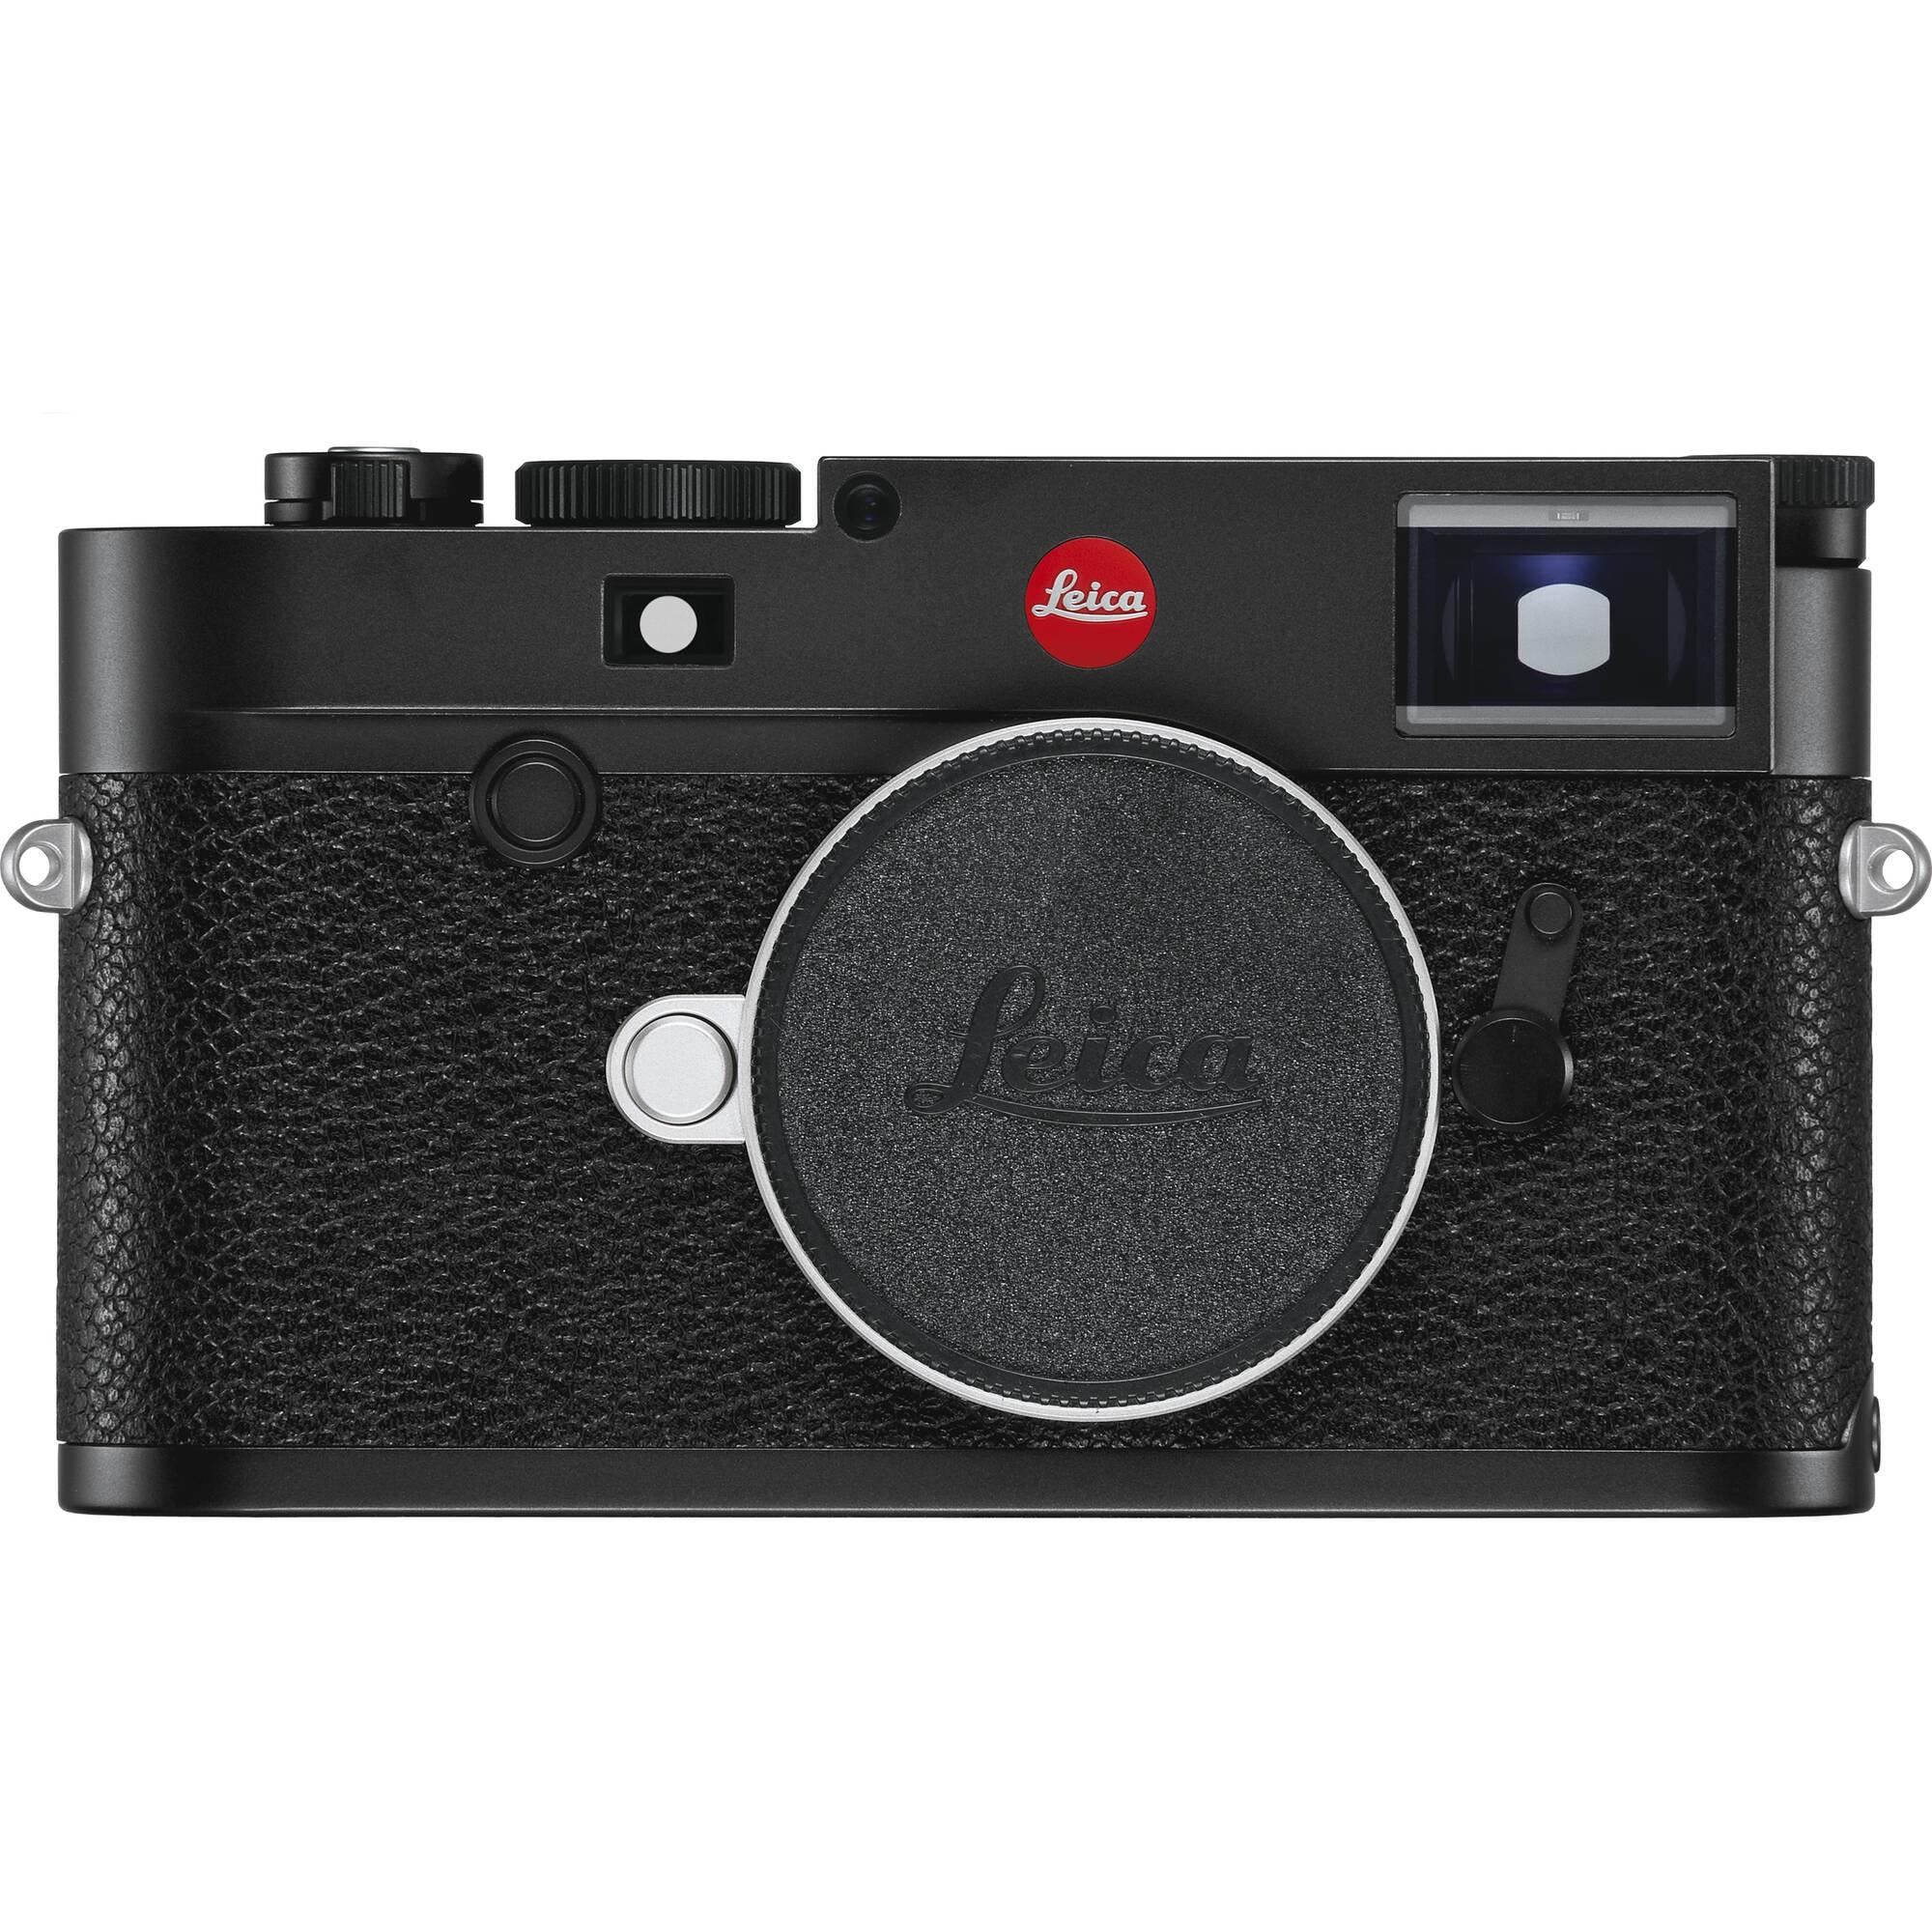 Leica M10-R svart kamerahus